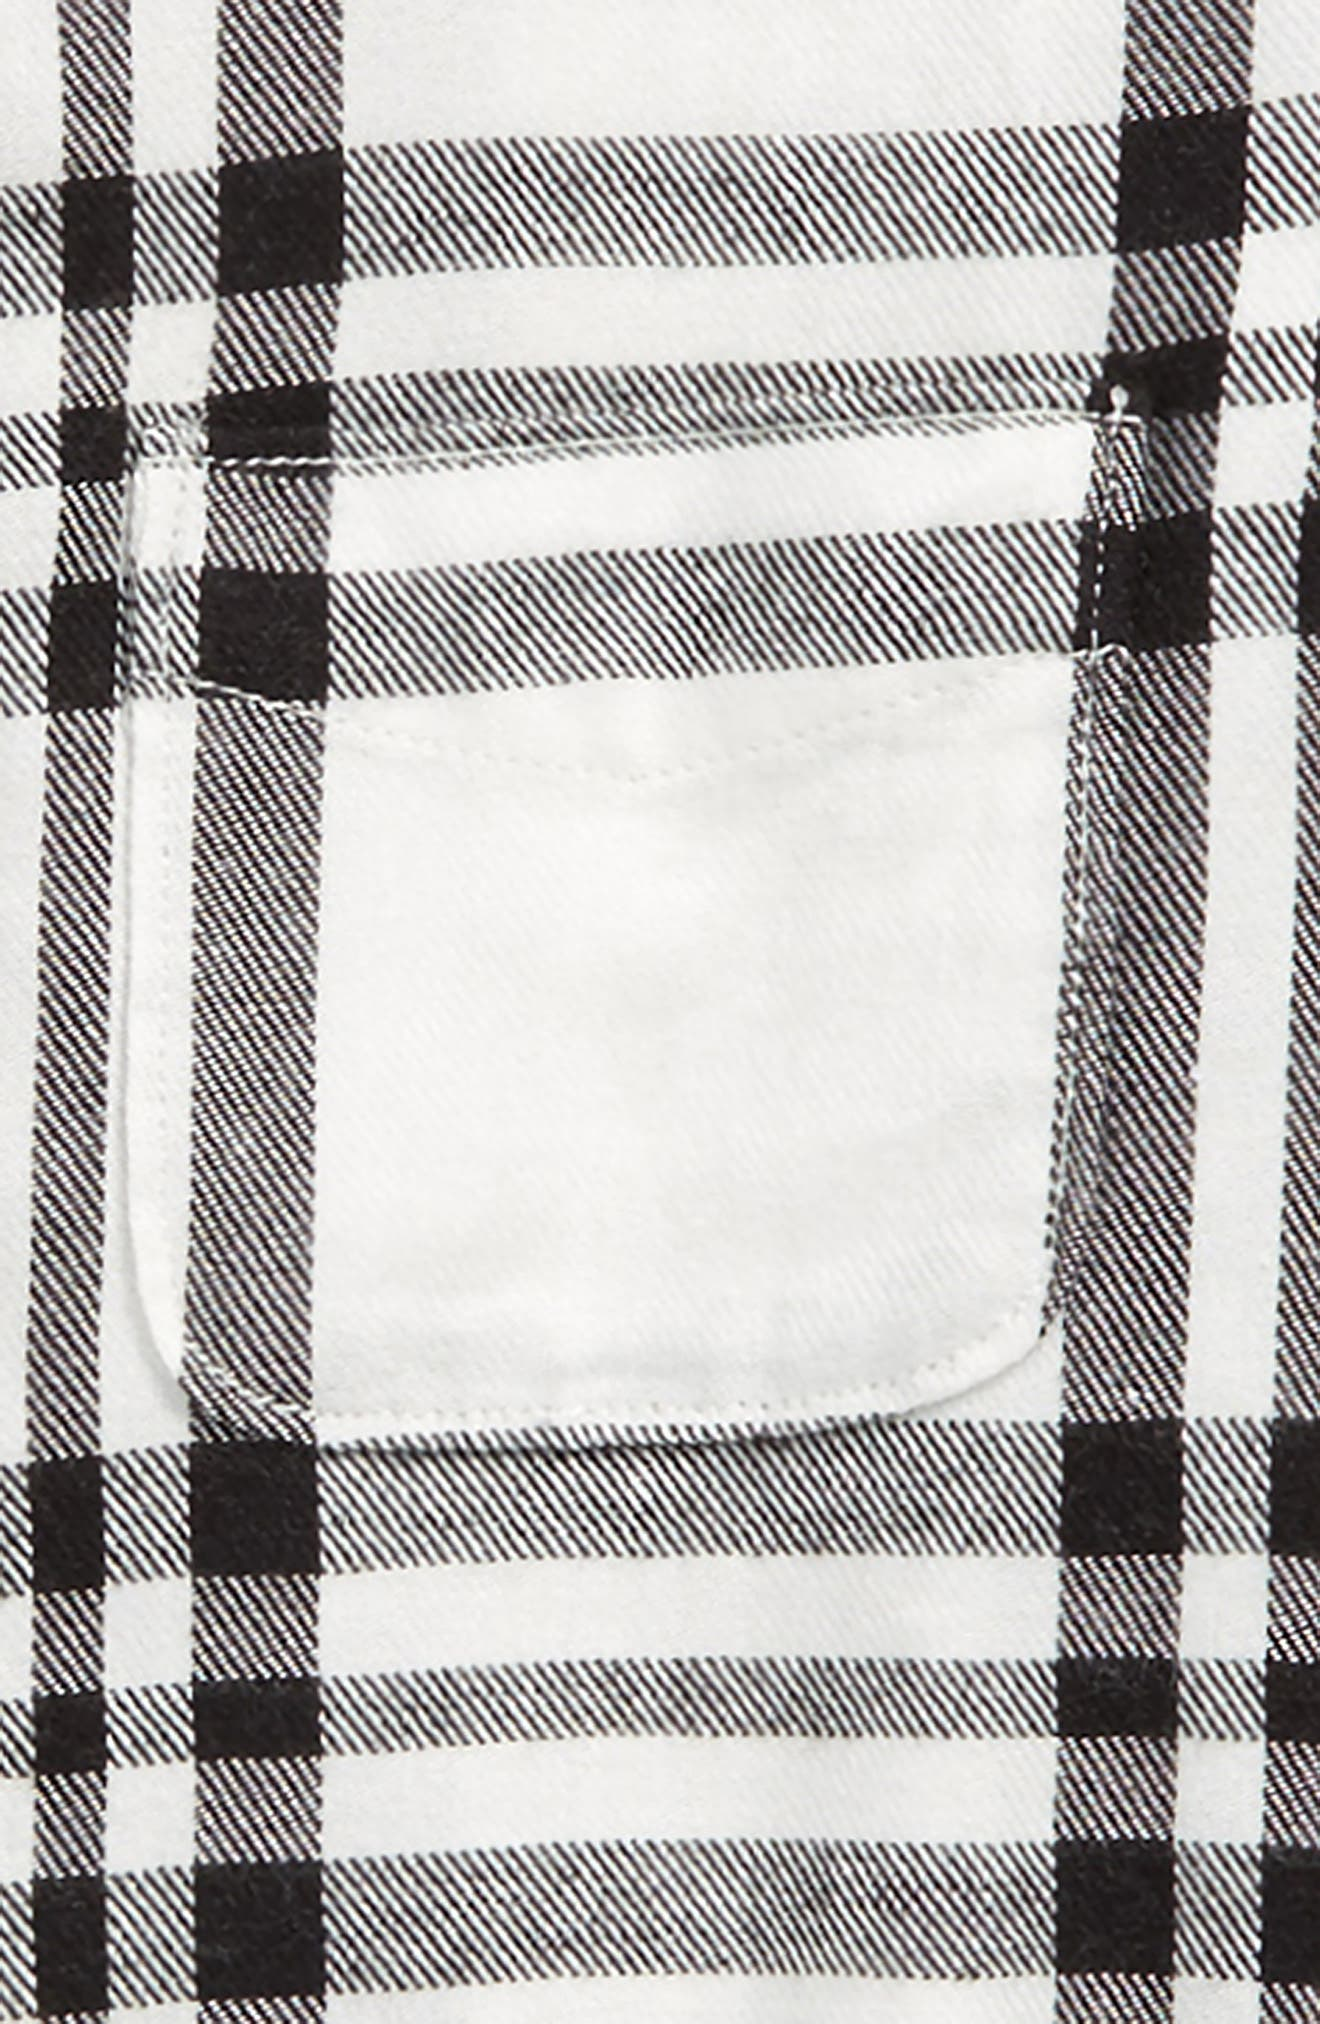 Jaspe Plaid Flannel Shirt,                             Alternate thumbnail 2, color,                             BLACK RAVEN BULLSEYE PLAID